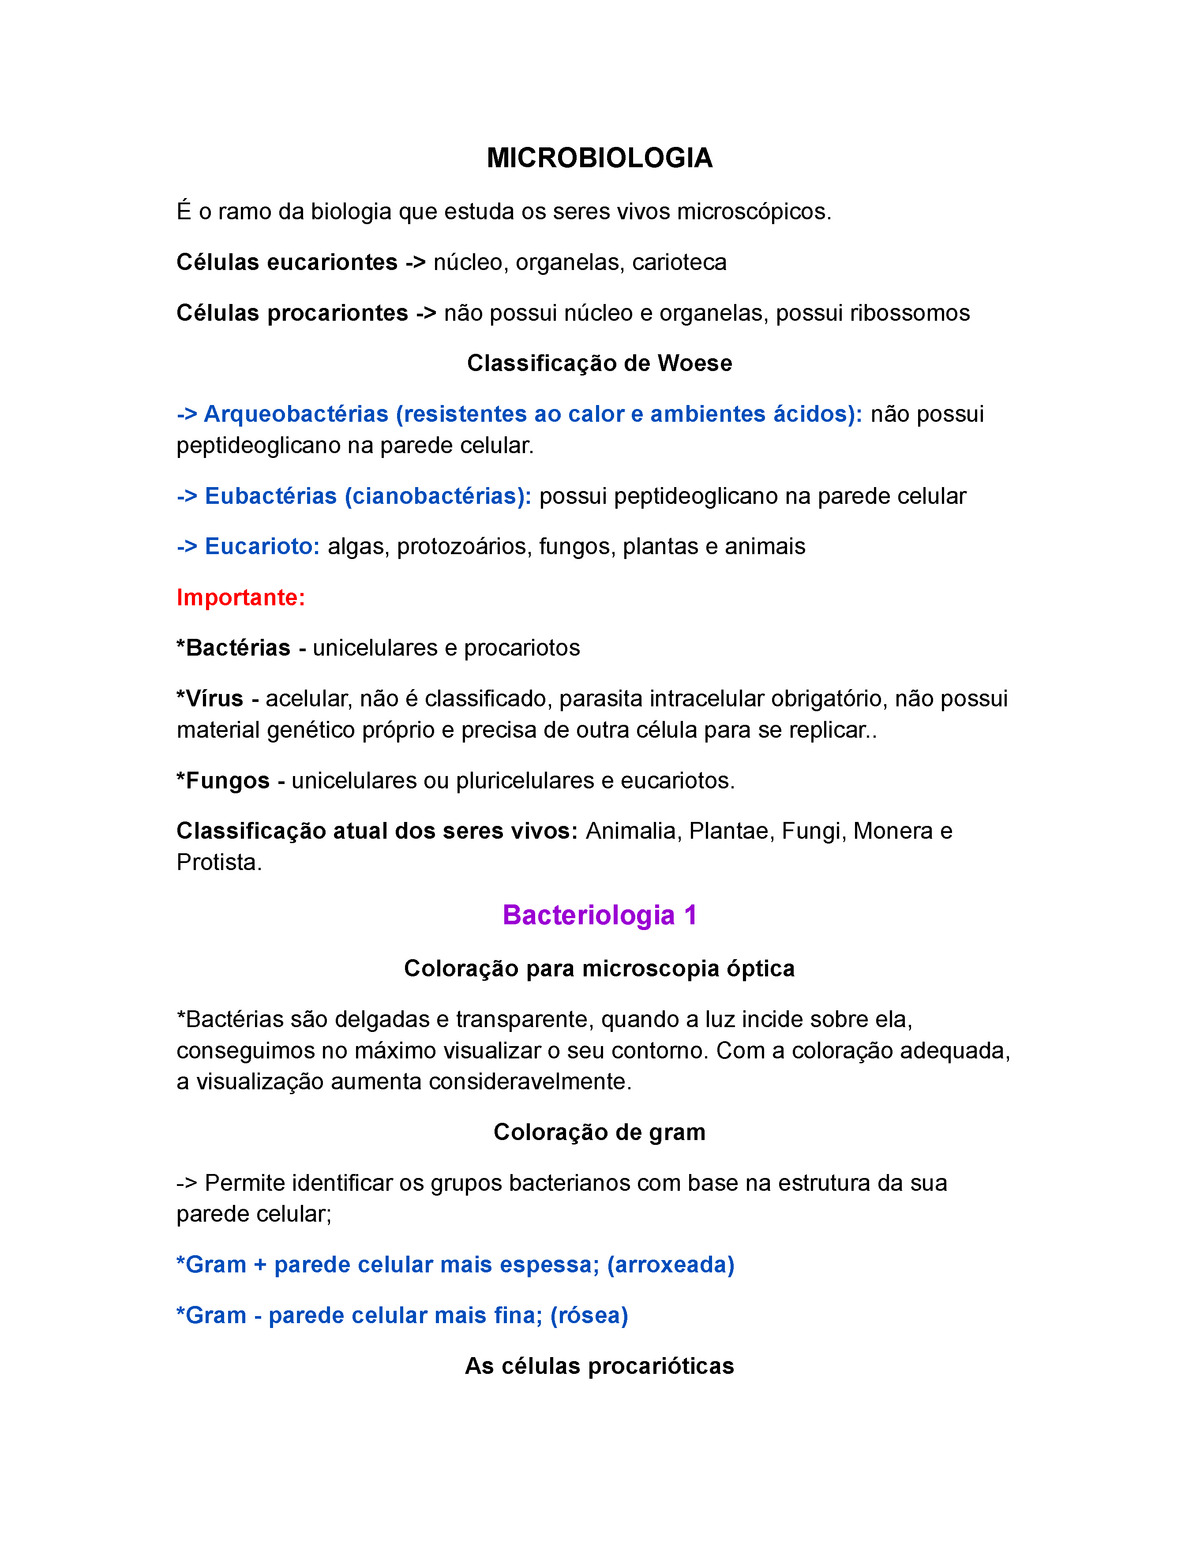 Microbiologia Resumo Enfermagem Enf88 Uva Studocu